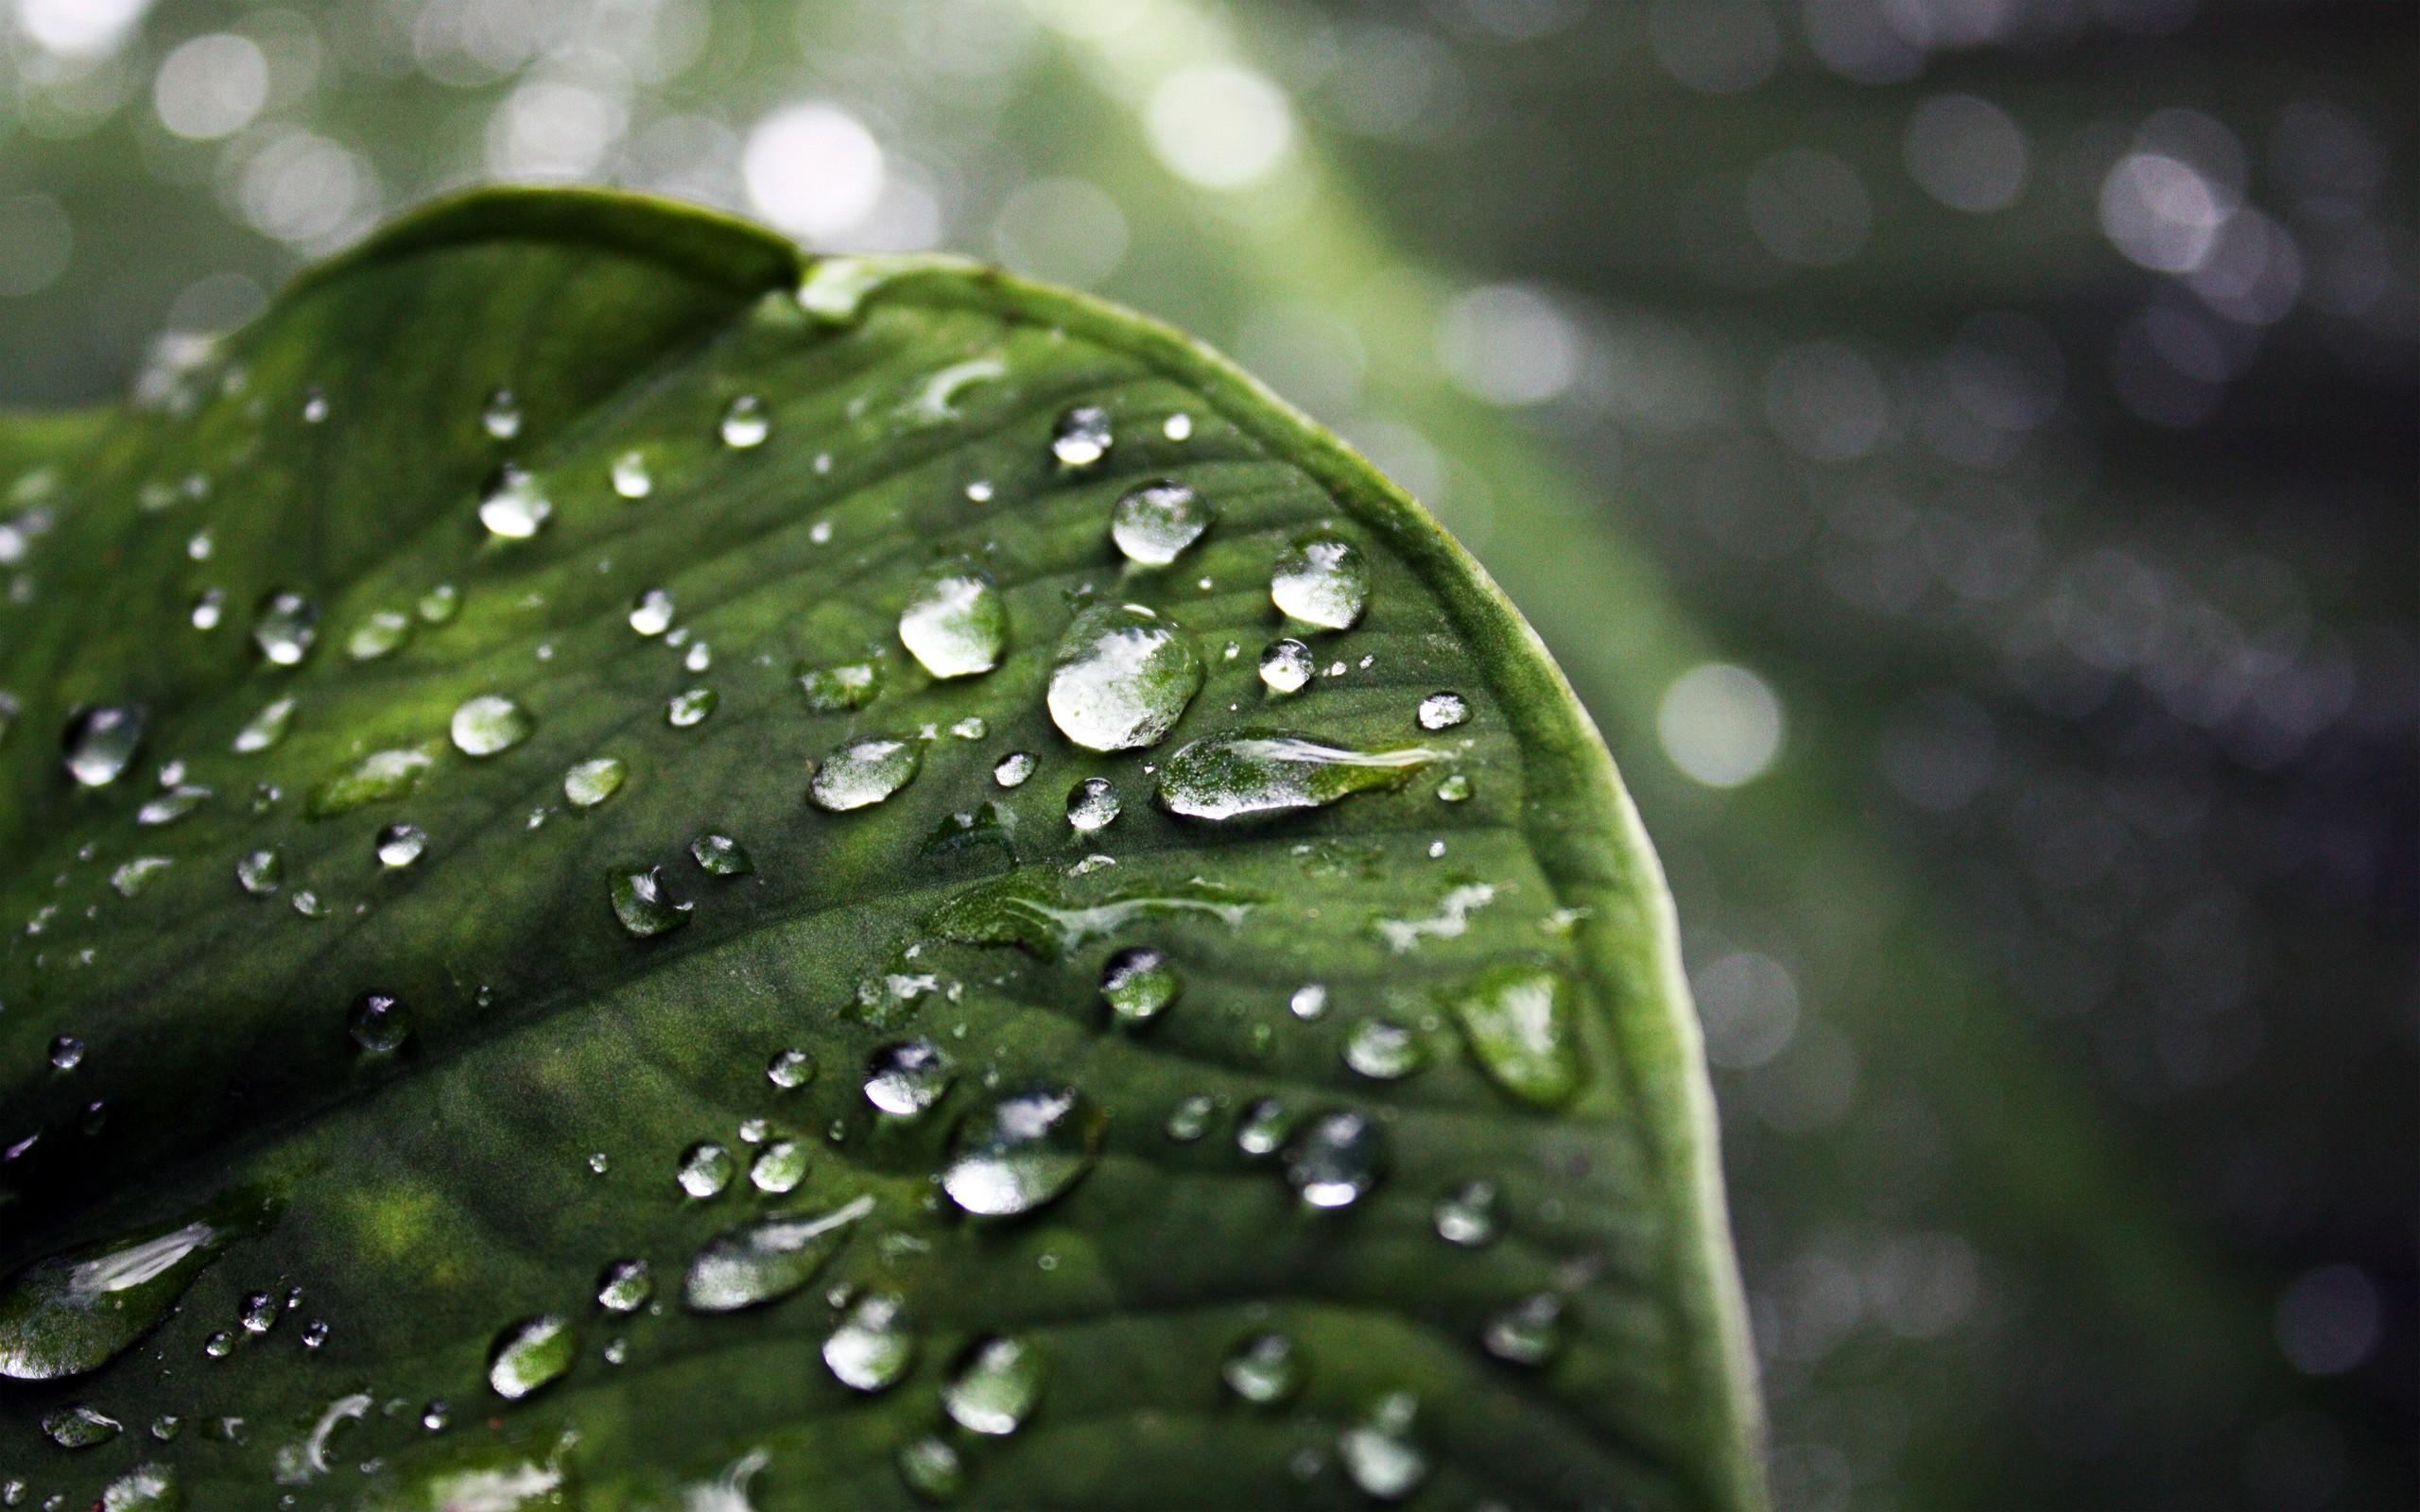 Sunlight Leaves Water Nature Drops Macro Green Dew Leaf Flower Plant Drop Flora 2560x1600 Px